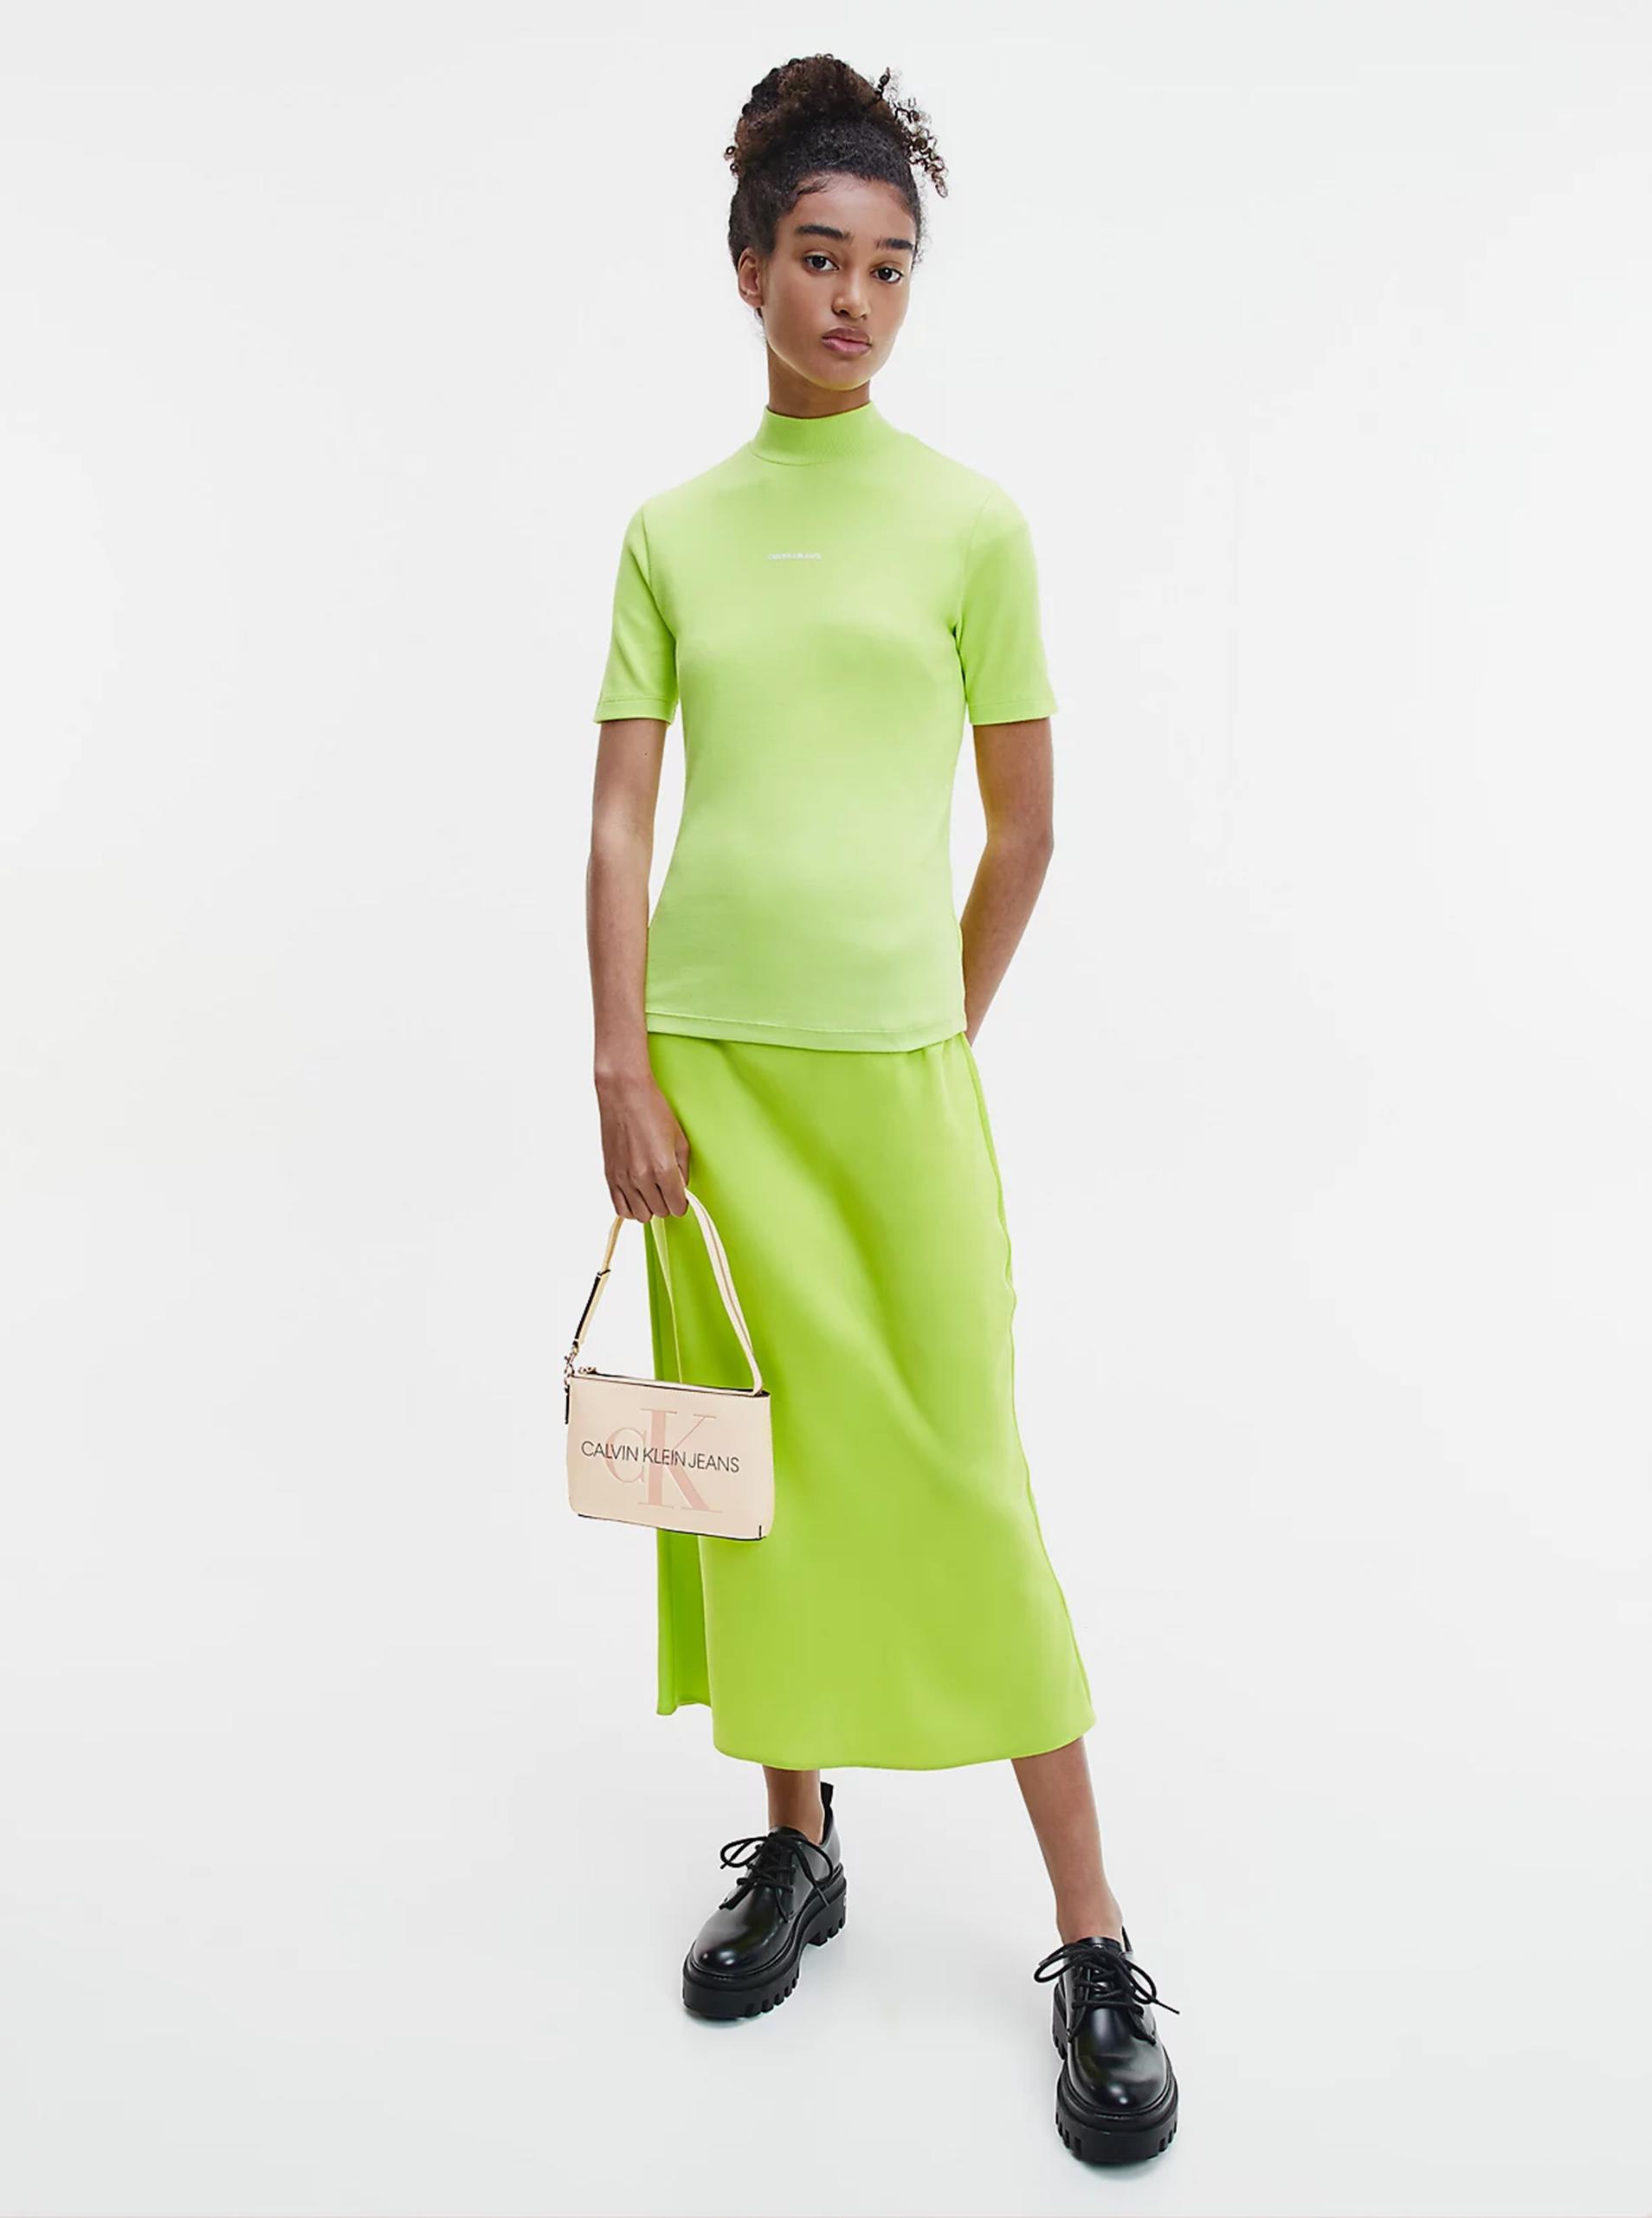 Calvin Klein smantanii/crem geanta